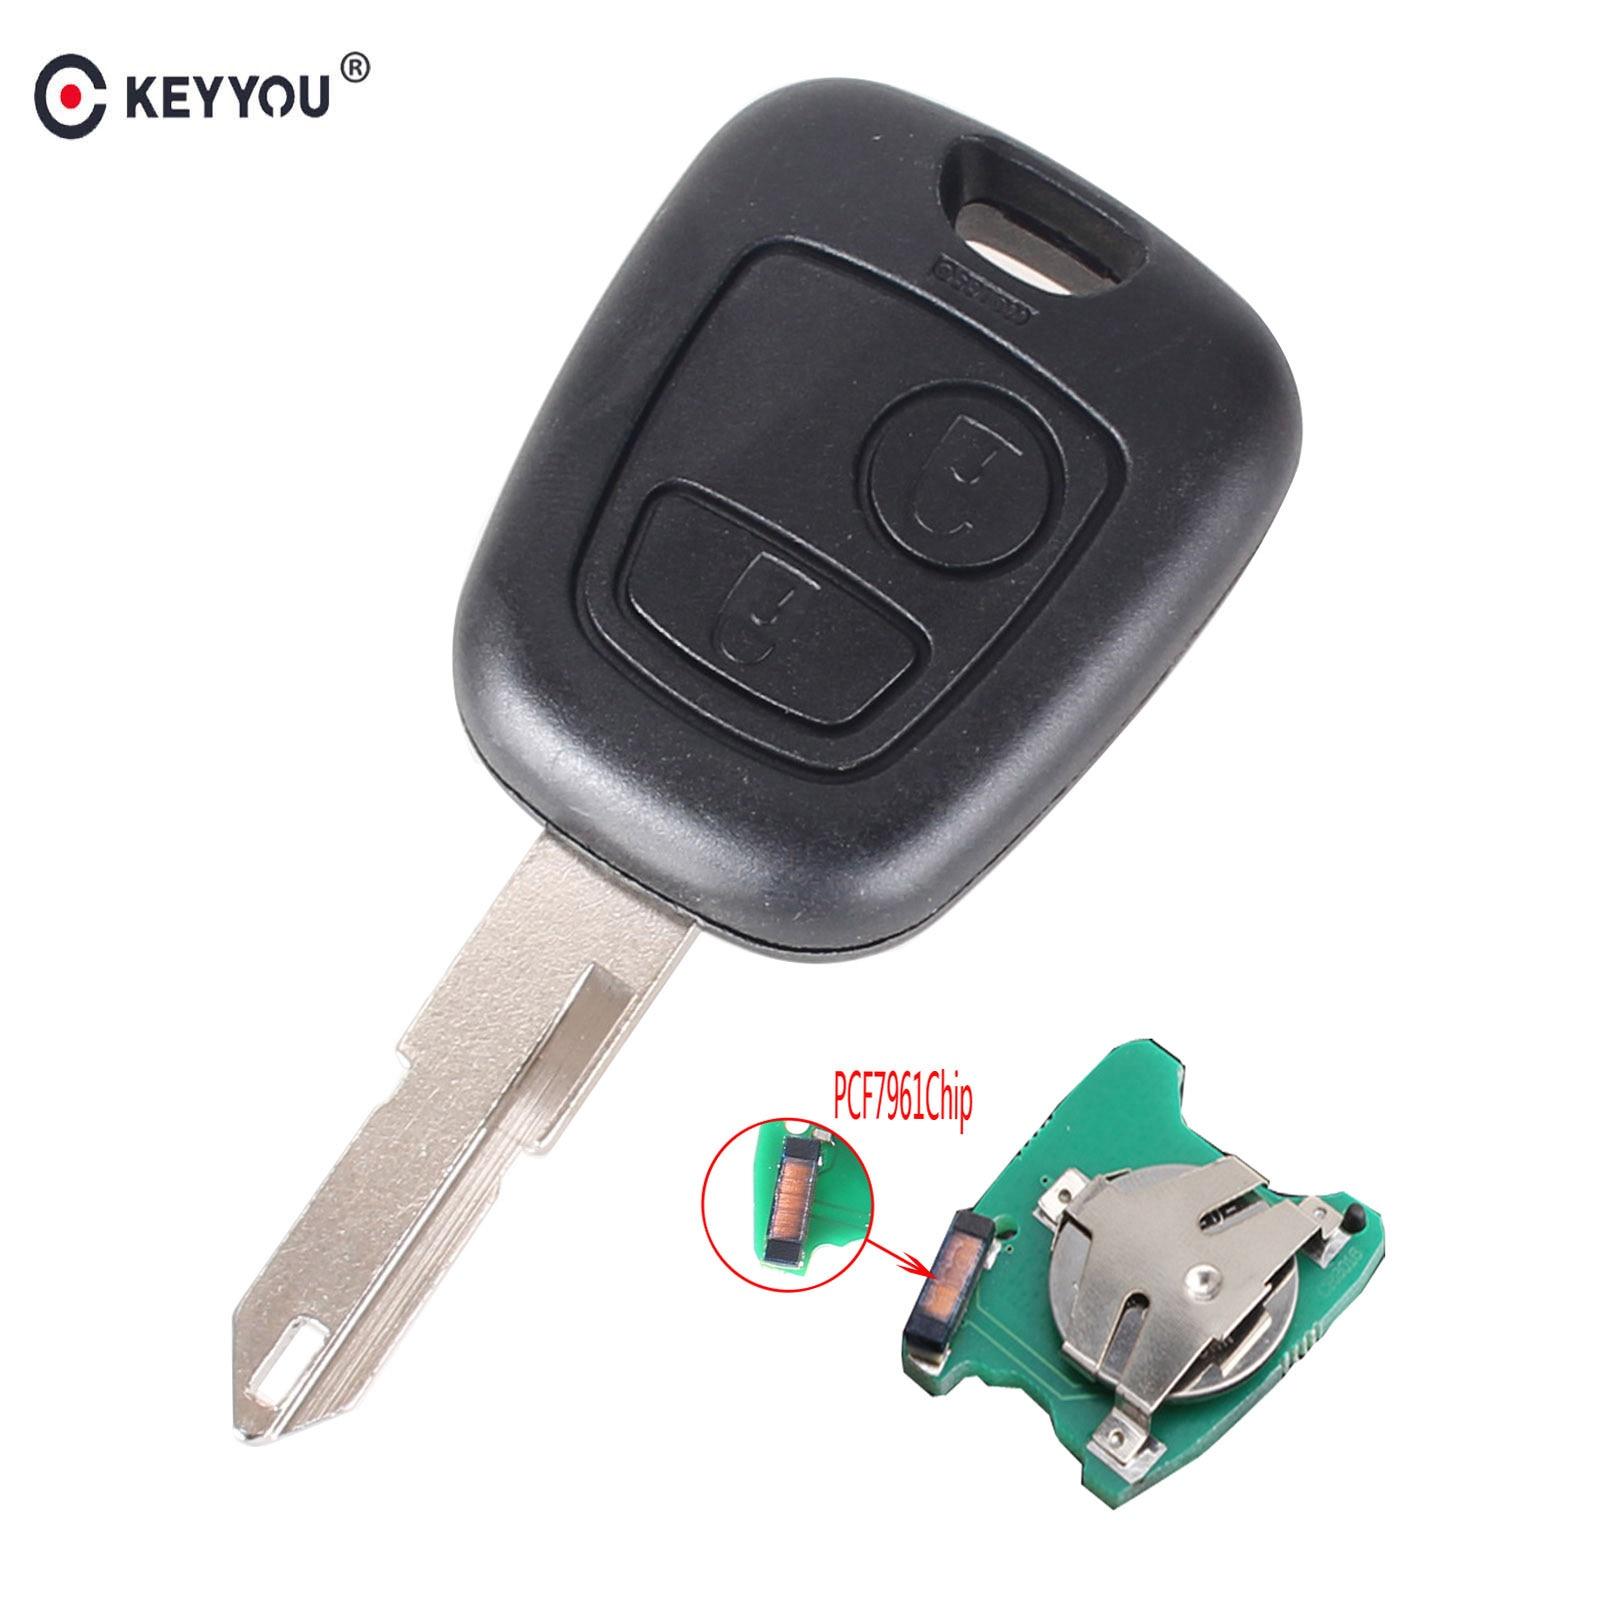 KEYYOU 2 Tasten FRAGEN Remote Key Fob Controller Für PEUGEOT 206 307 Partner Citroen C1 C3 433MHZ Mit PCF7961 transponder Chip